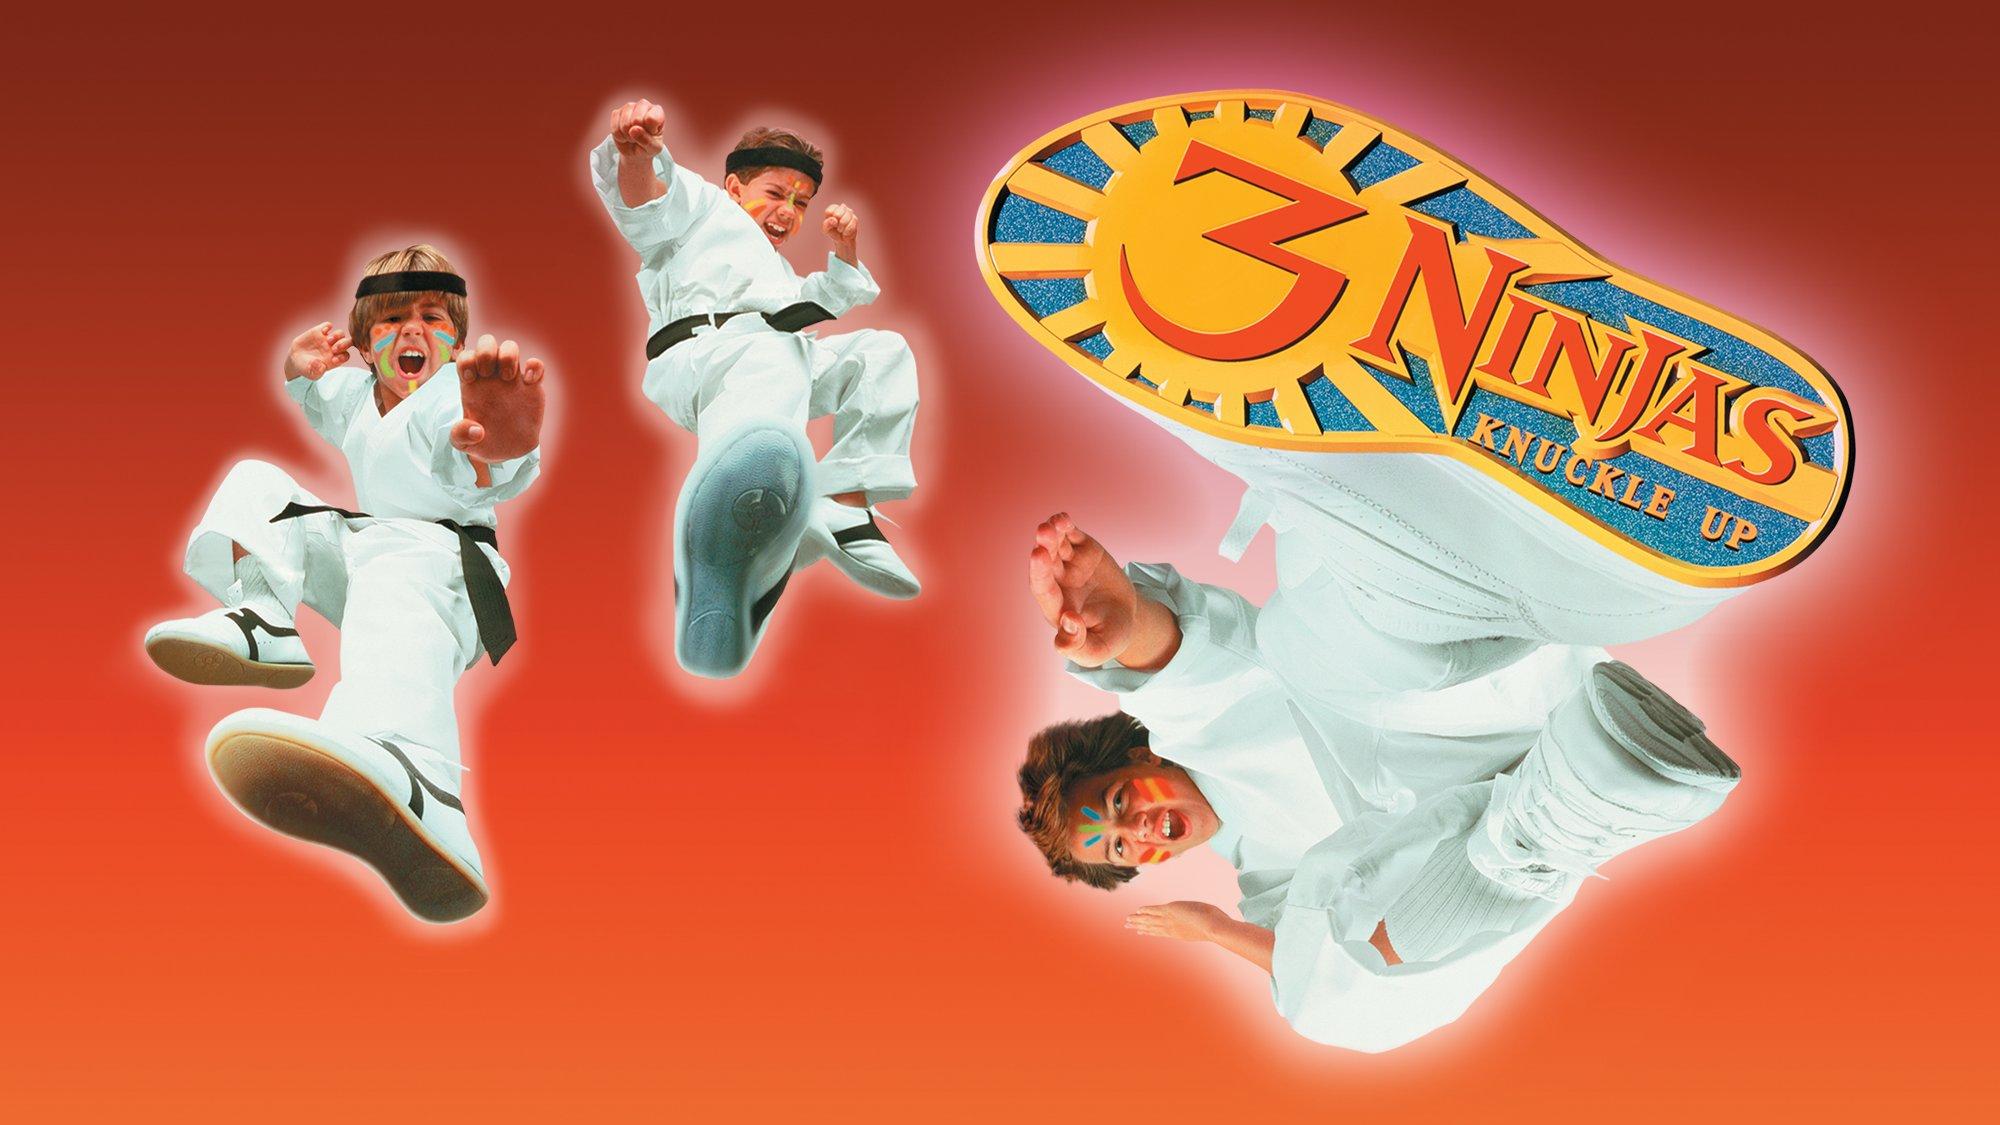 3 ninjas knuckle up full movie free download